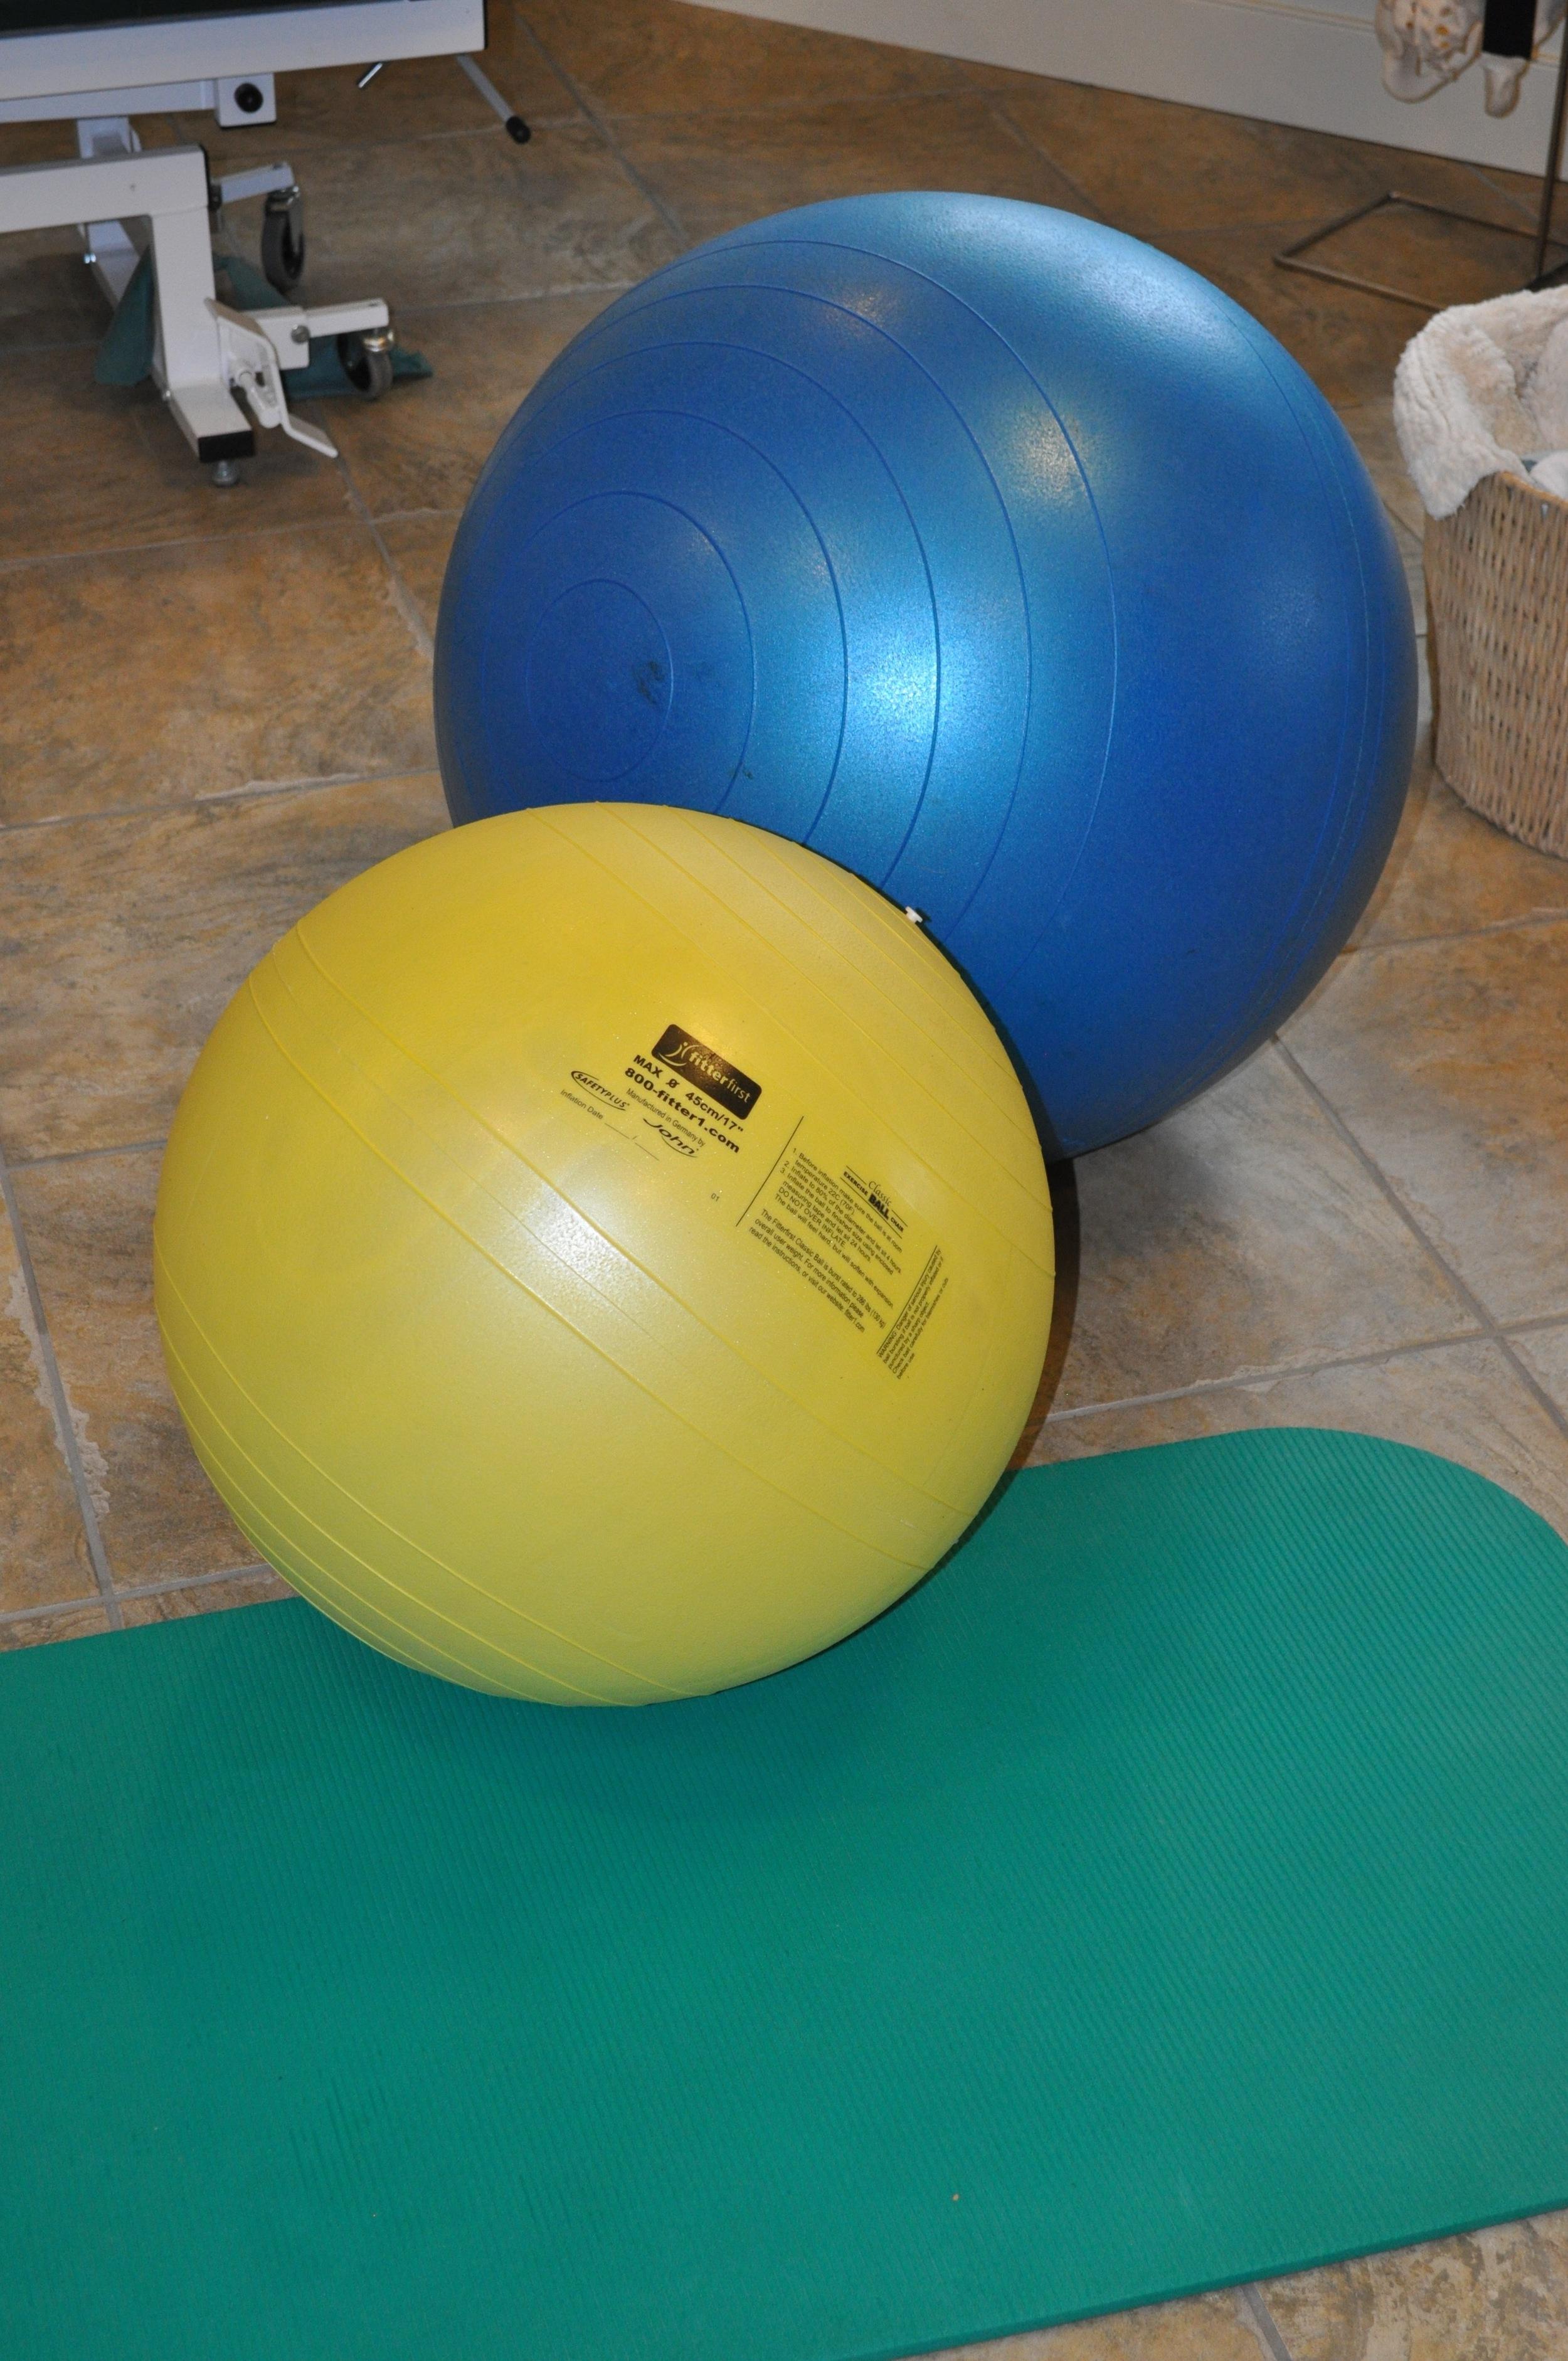 A wide range of rehabilitation equipment for sale.